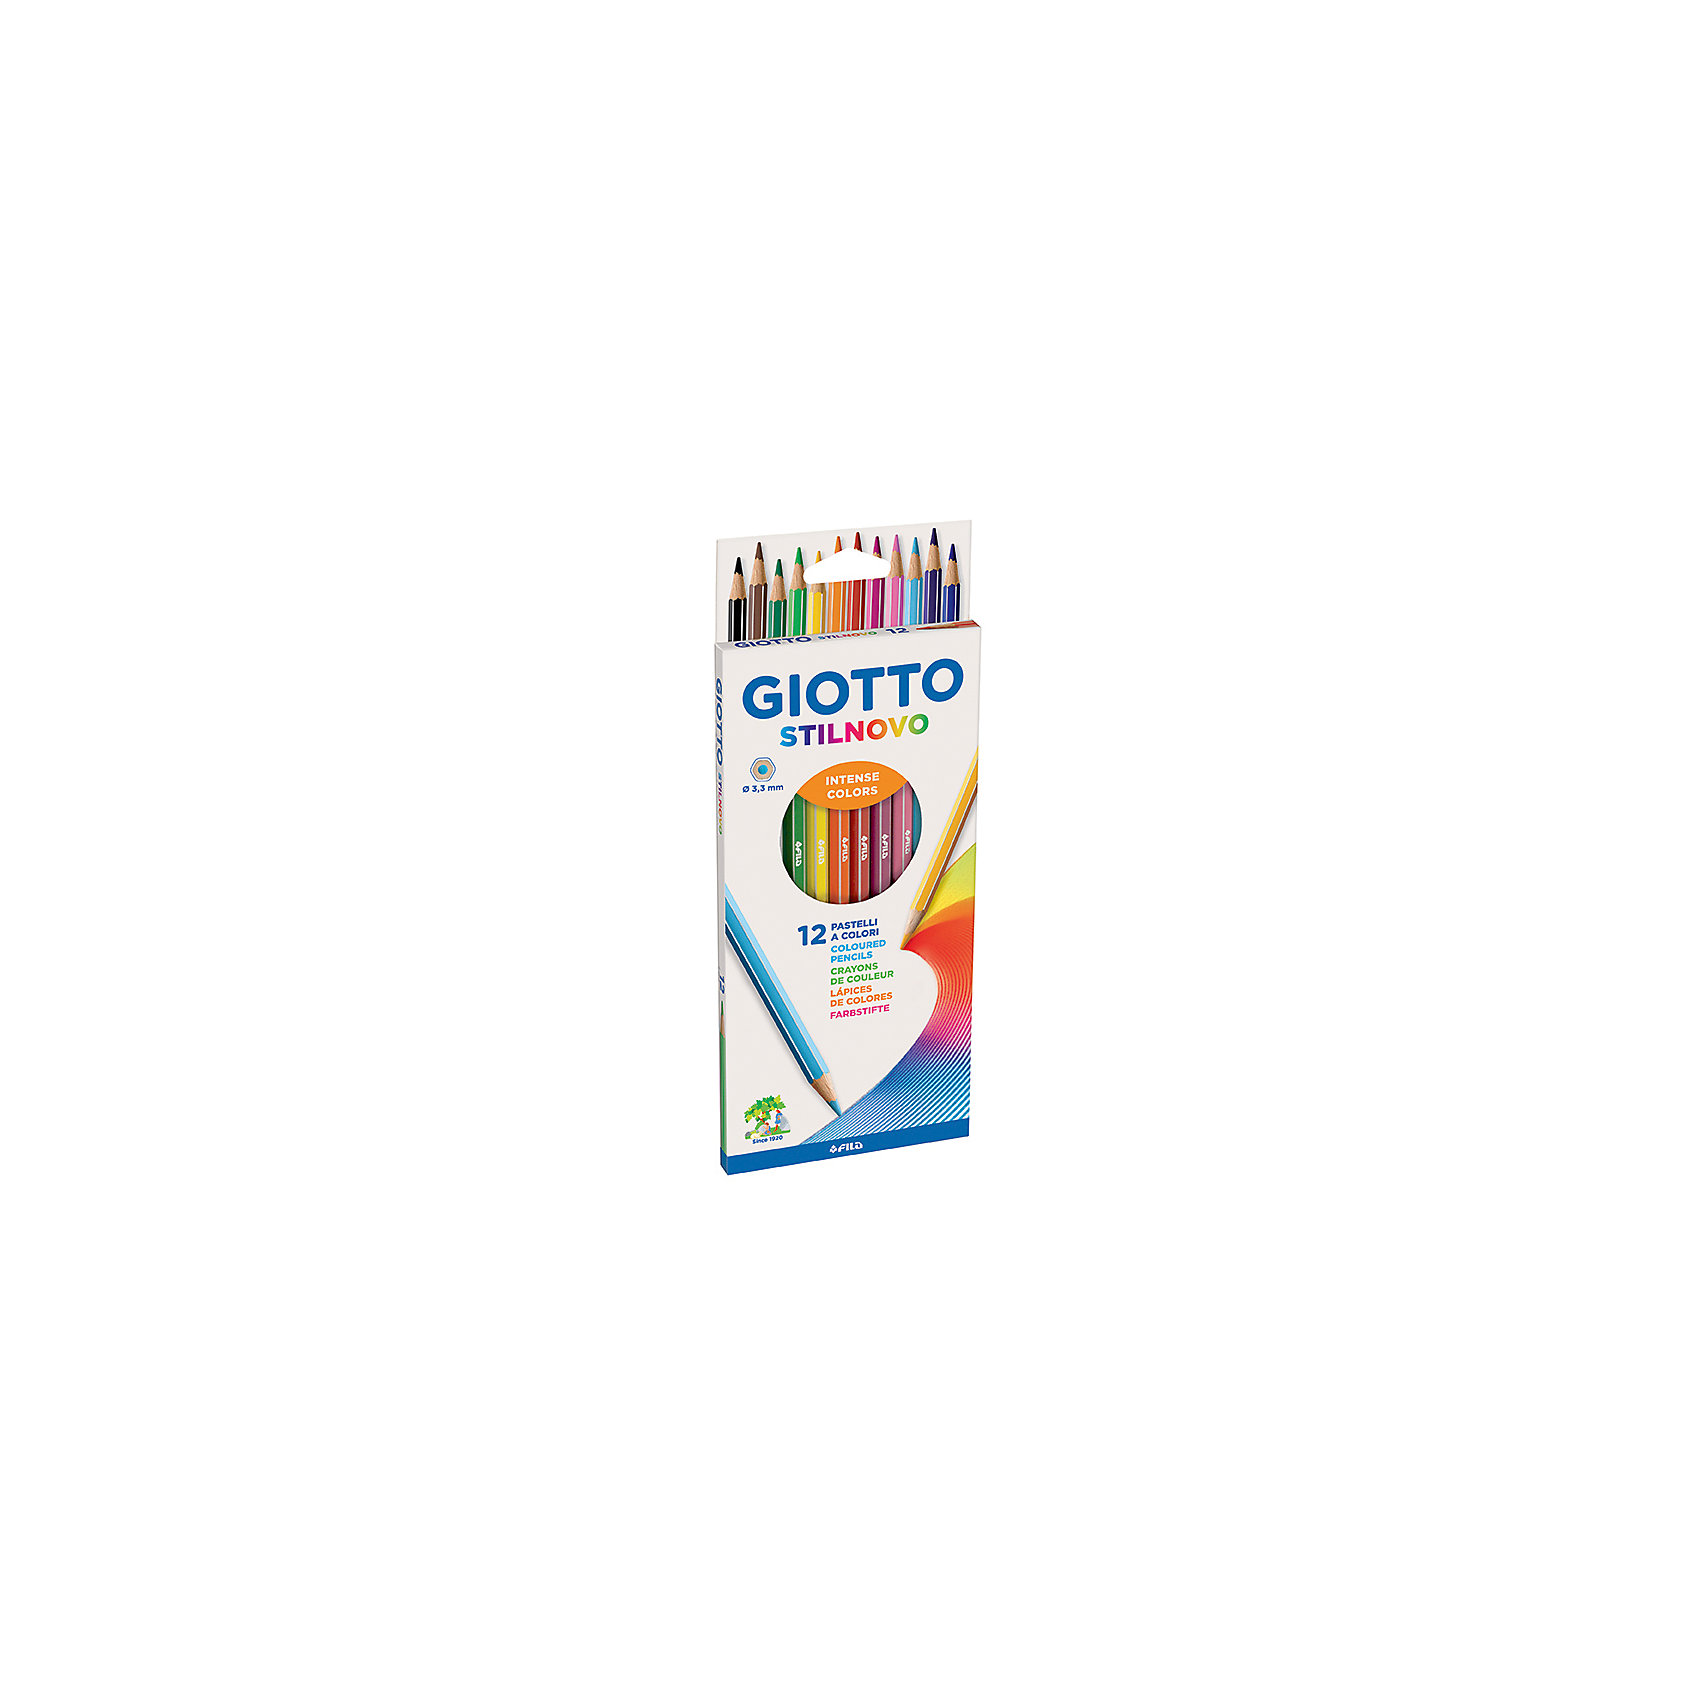 GIOTTO Цветные карандаши, 12 шт. giotto stilnovo цветные гексагональные 24 цвета